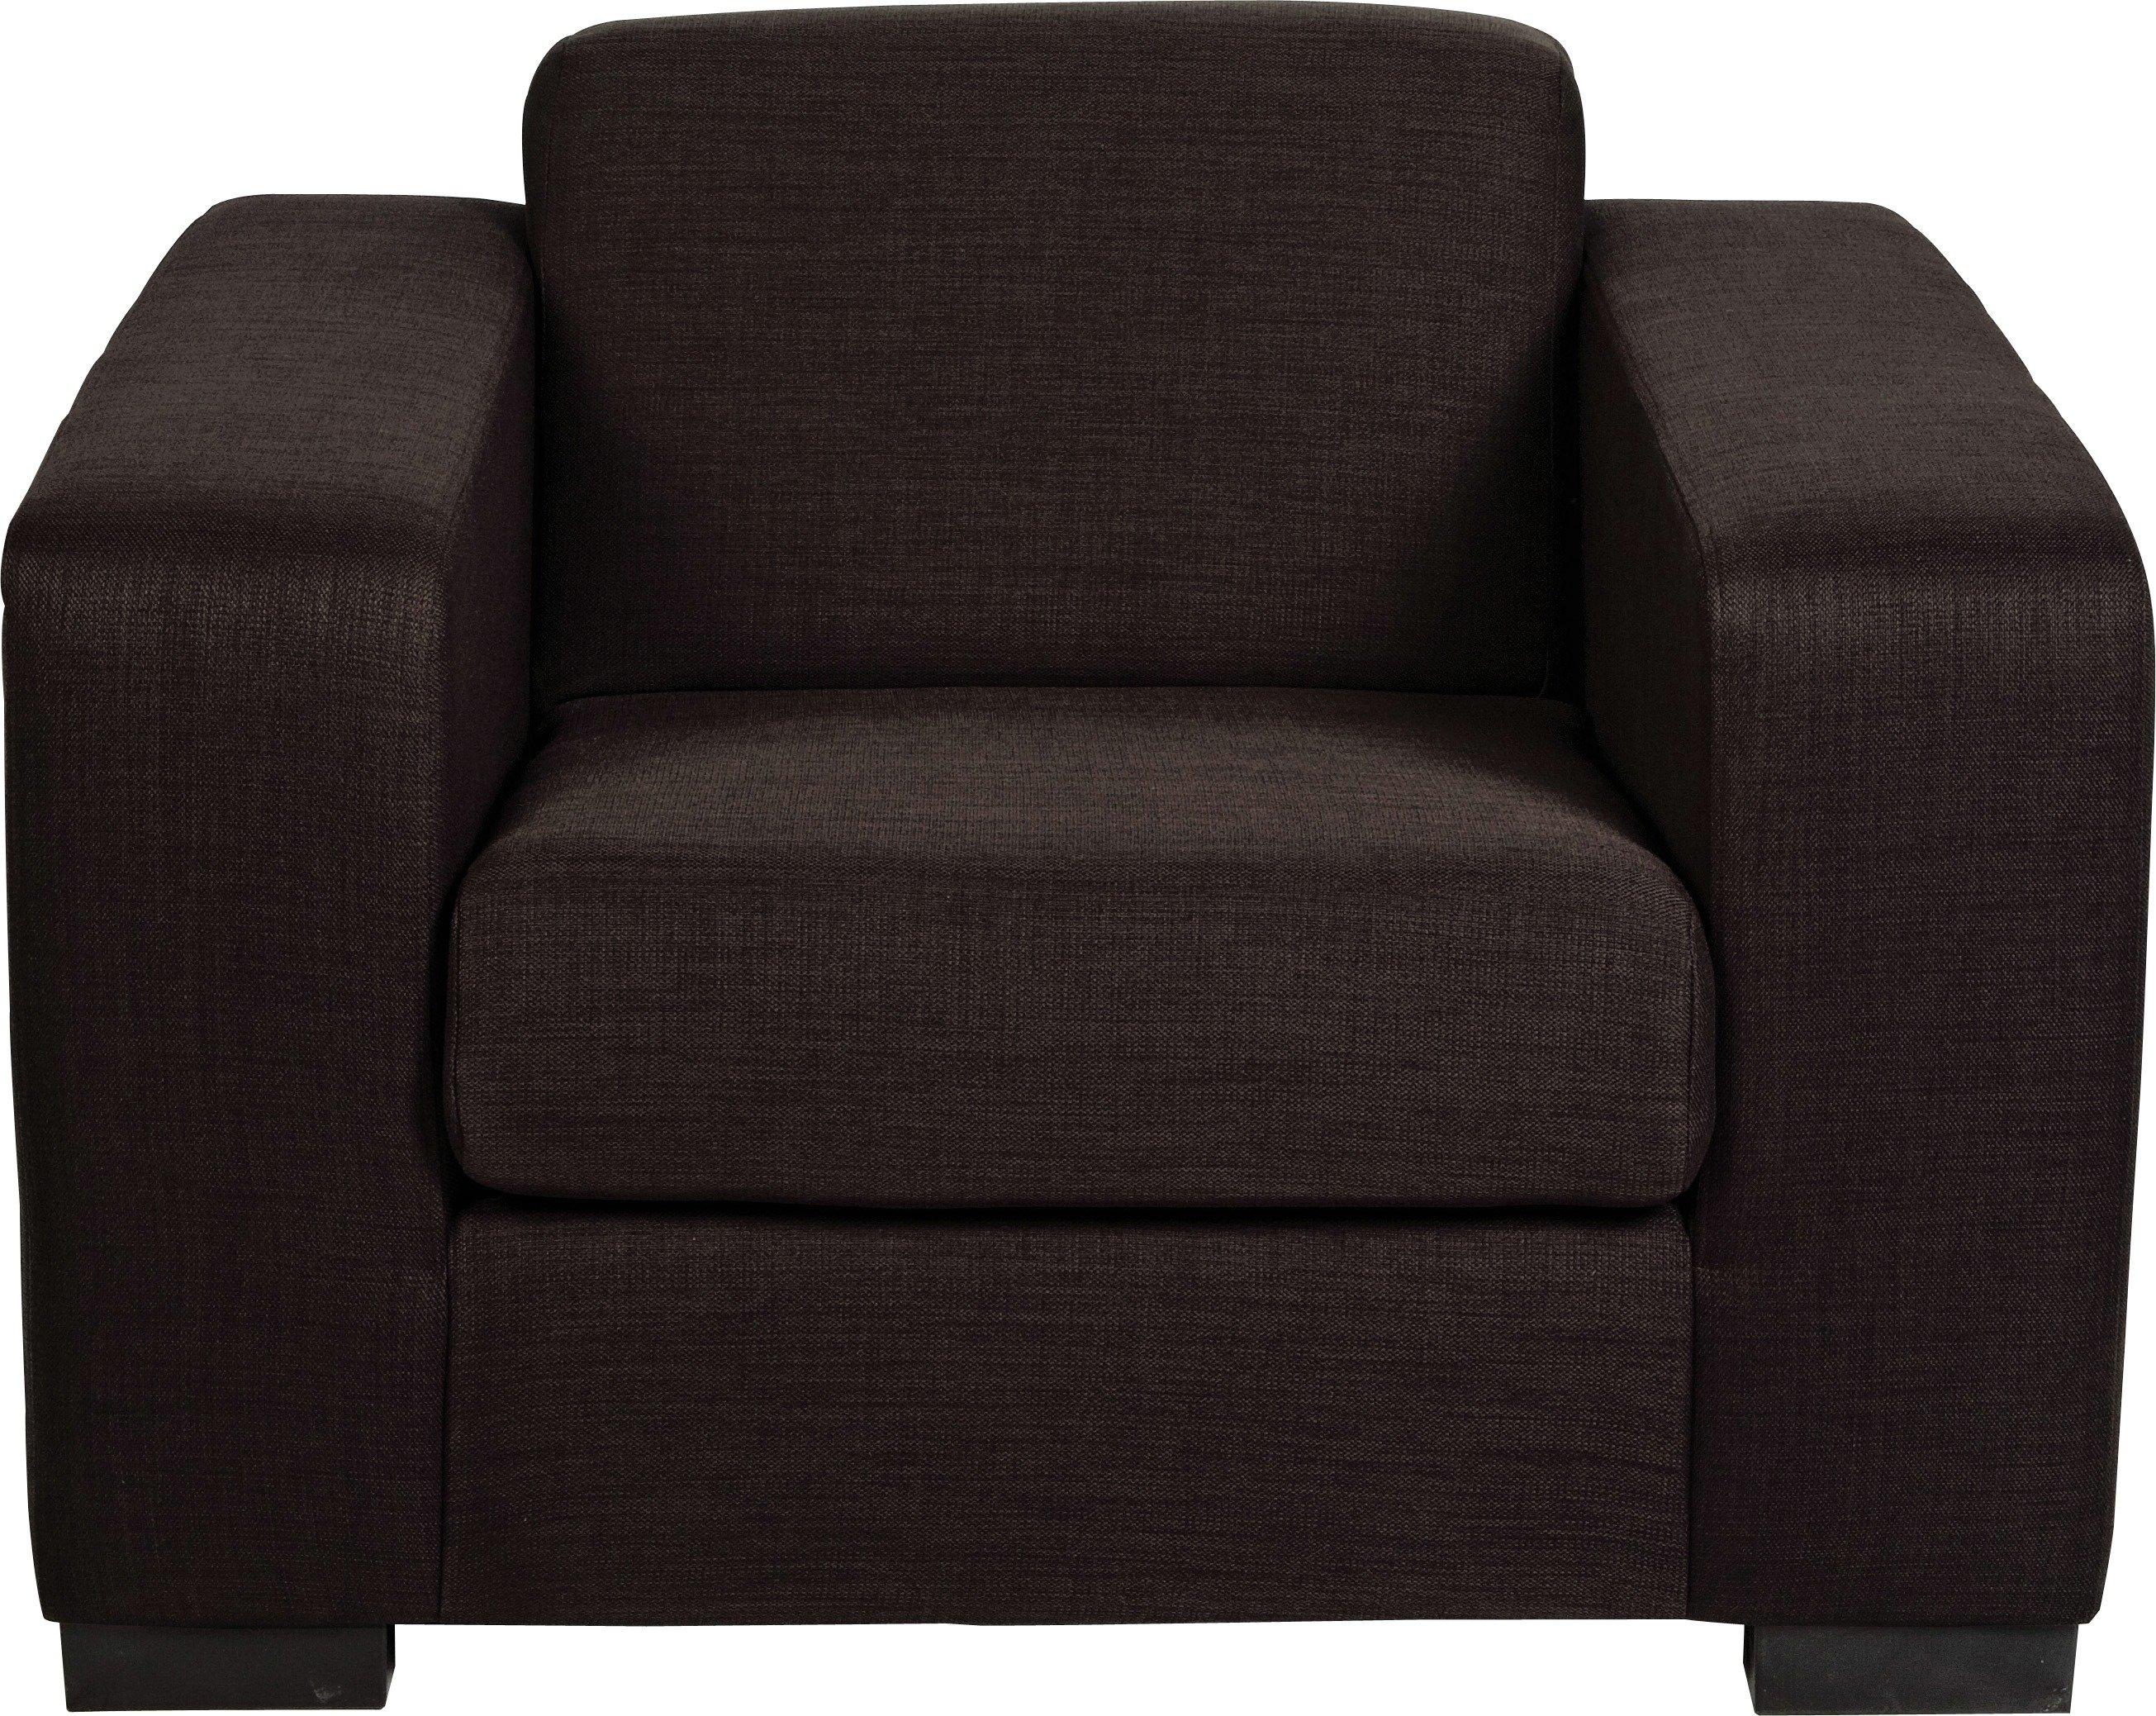 argos ava fabric sofa review light blue covers hygena new chair mocha